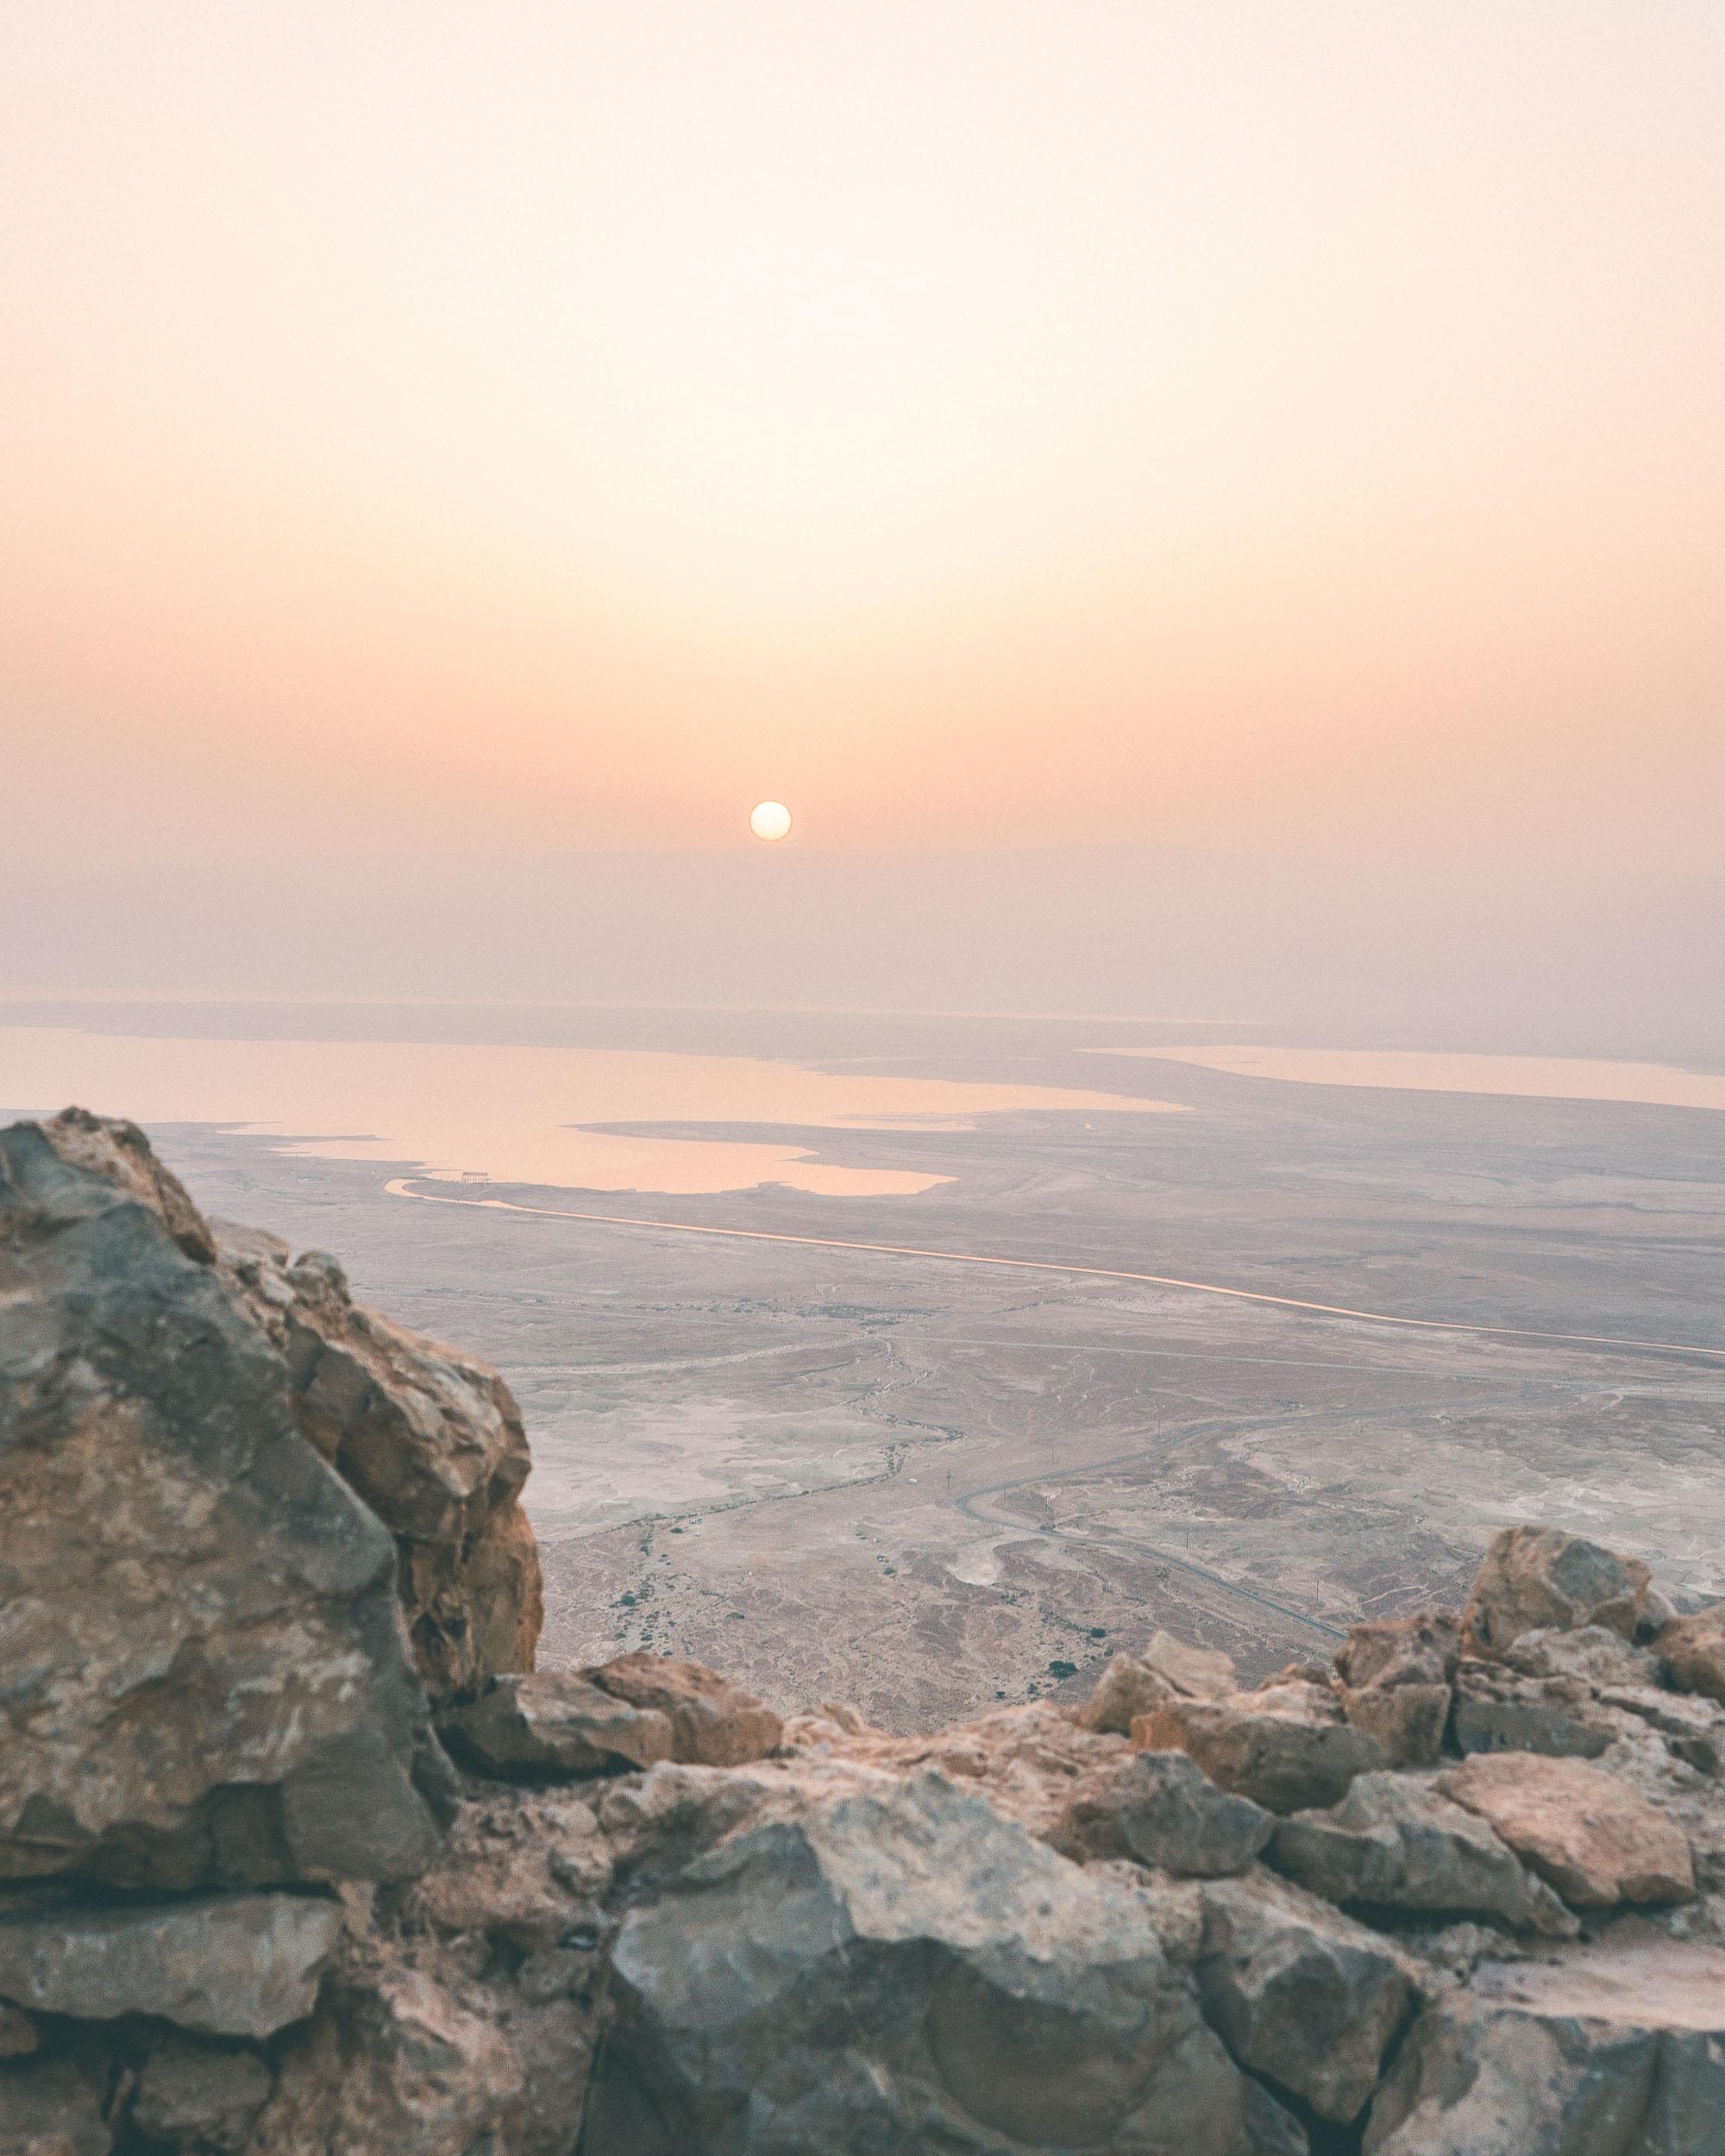 Sunrise over Masada in Israel